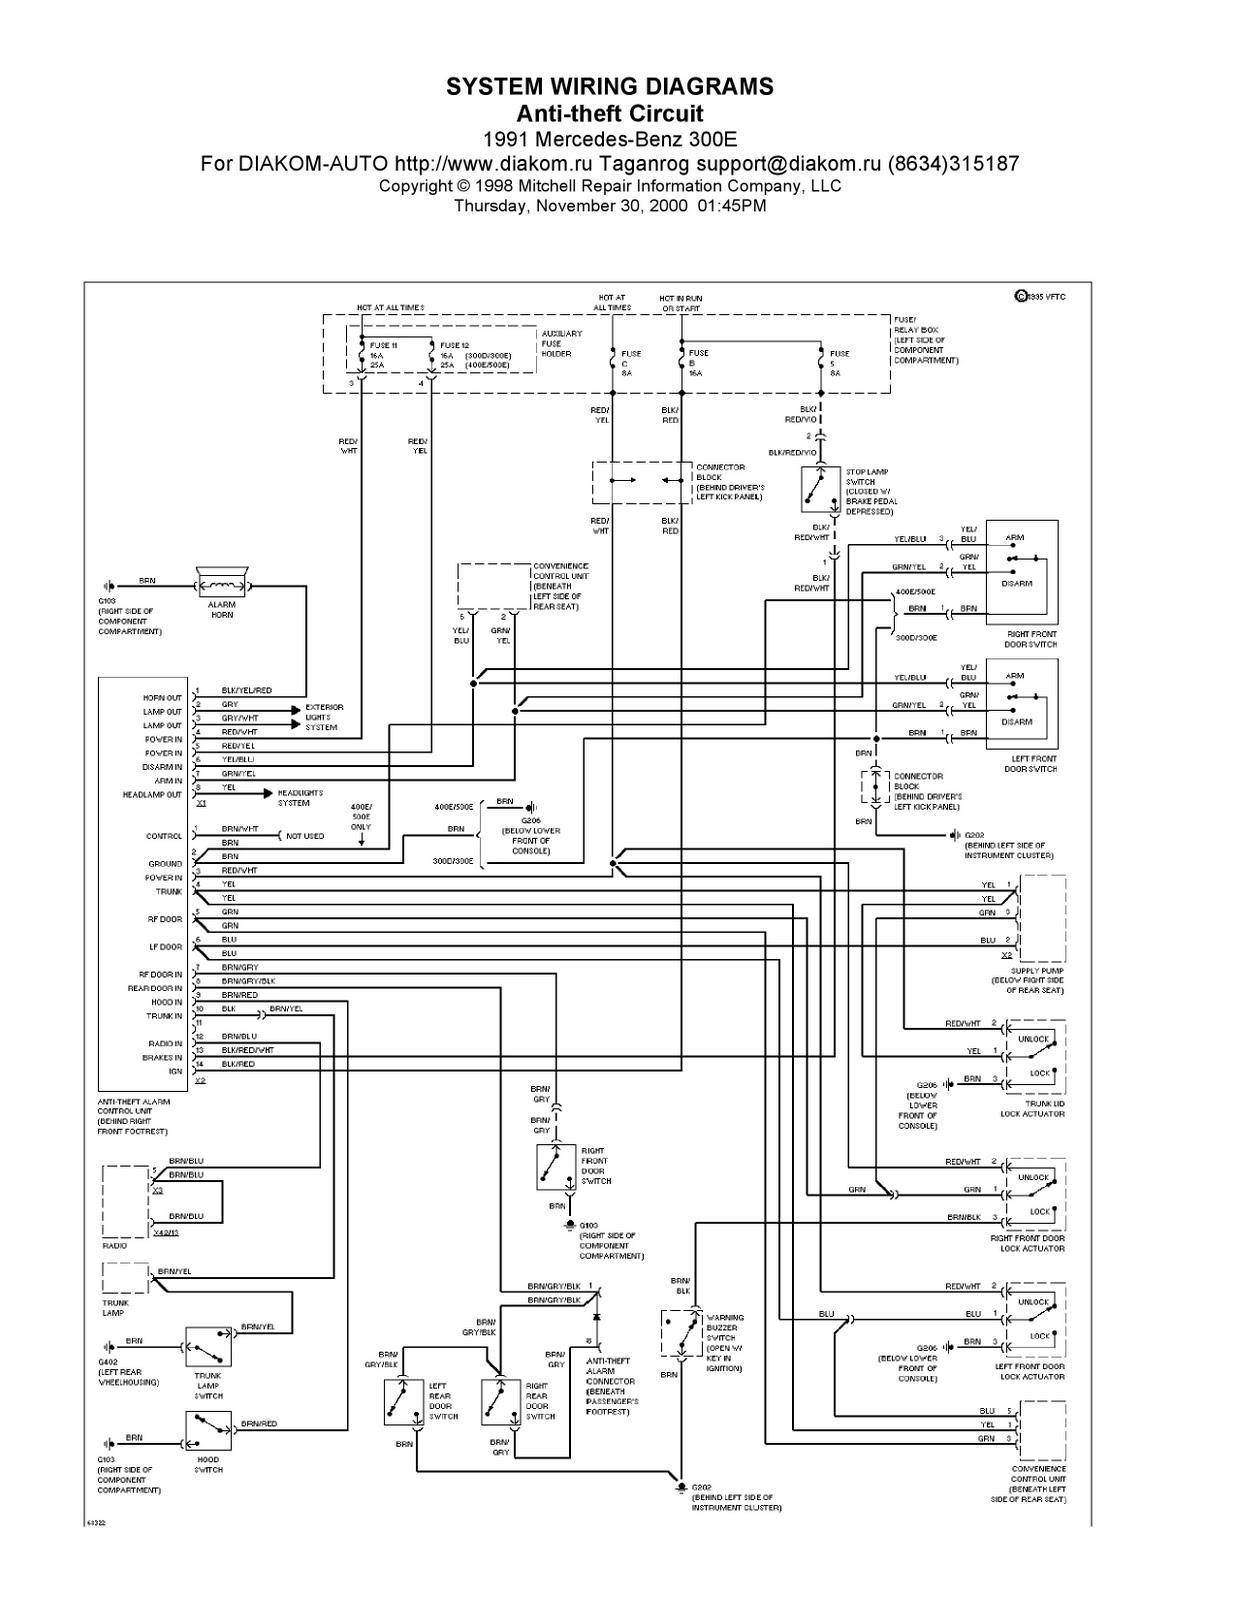 2005 E500 Fuse Diagram - Wiring Diagrams List